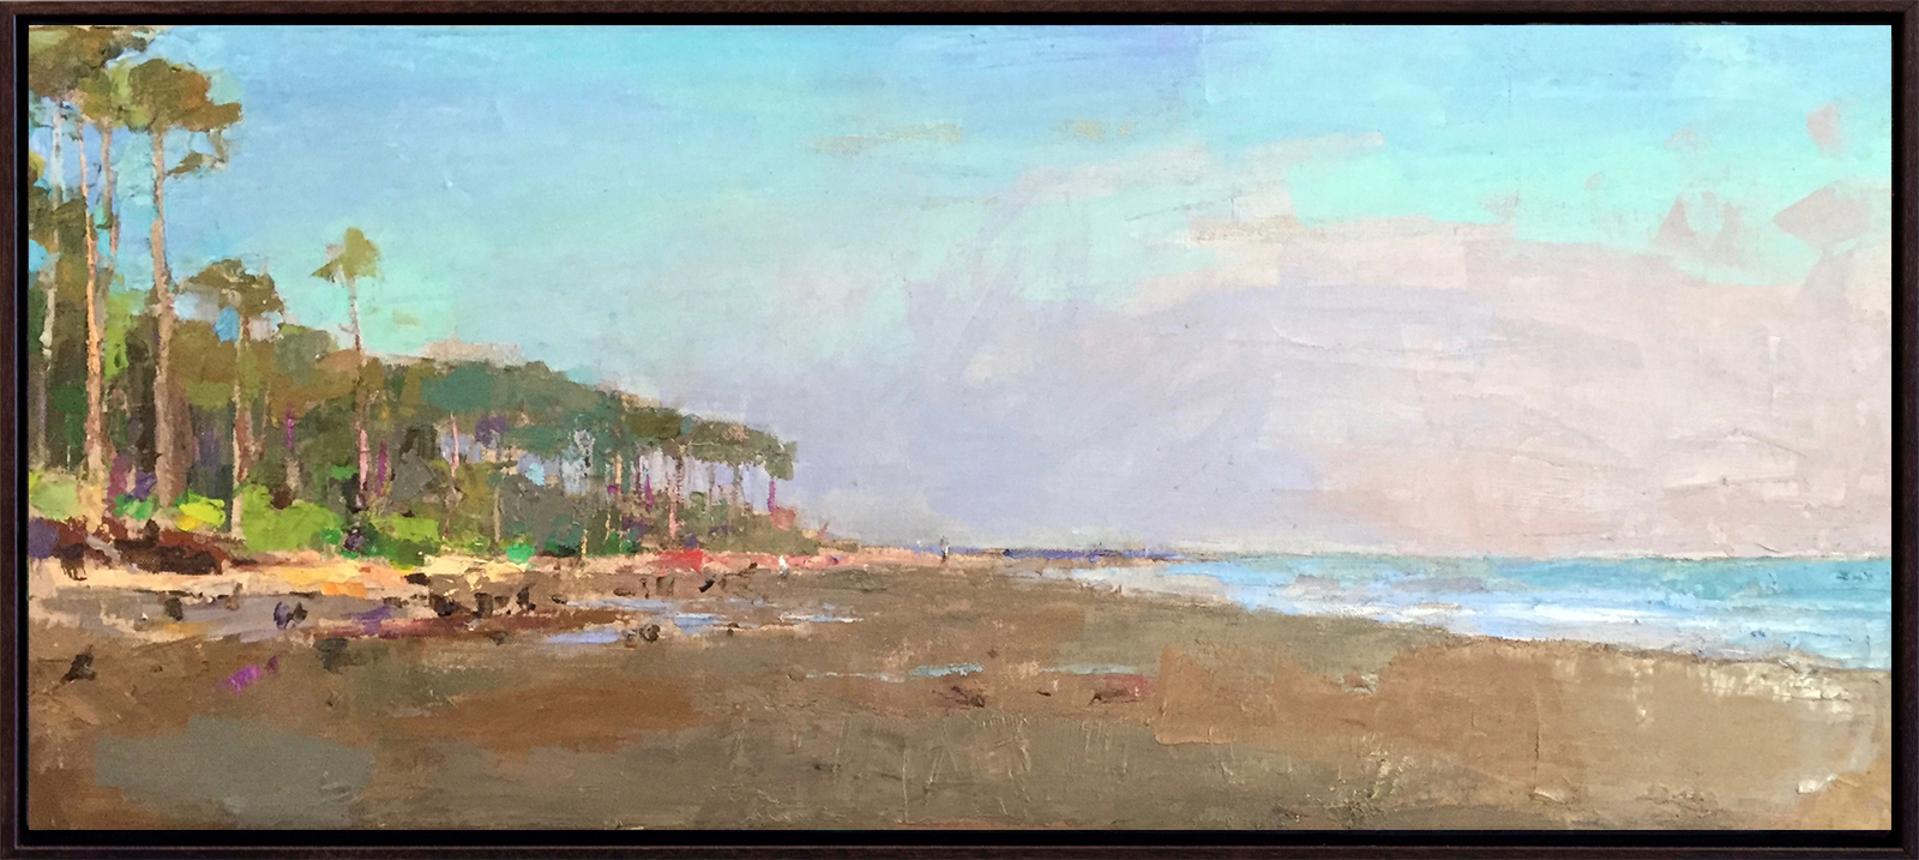 Hunting Island by Larry Horowitz